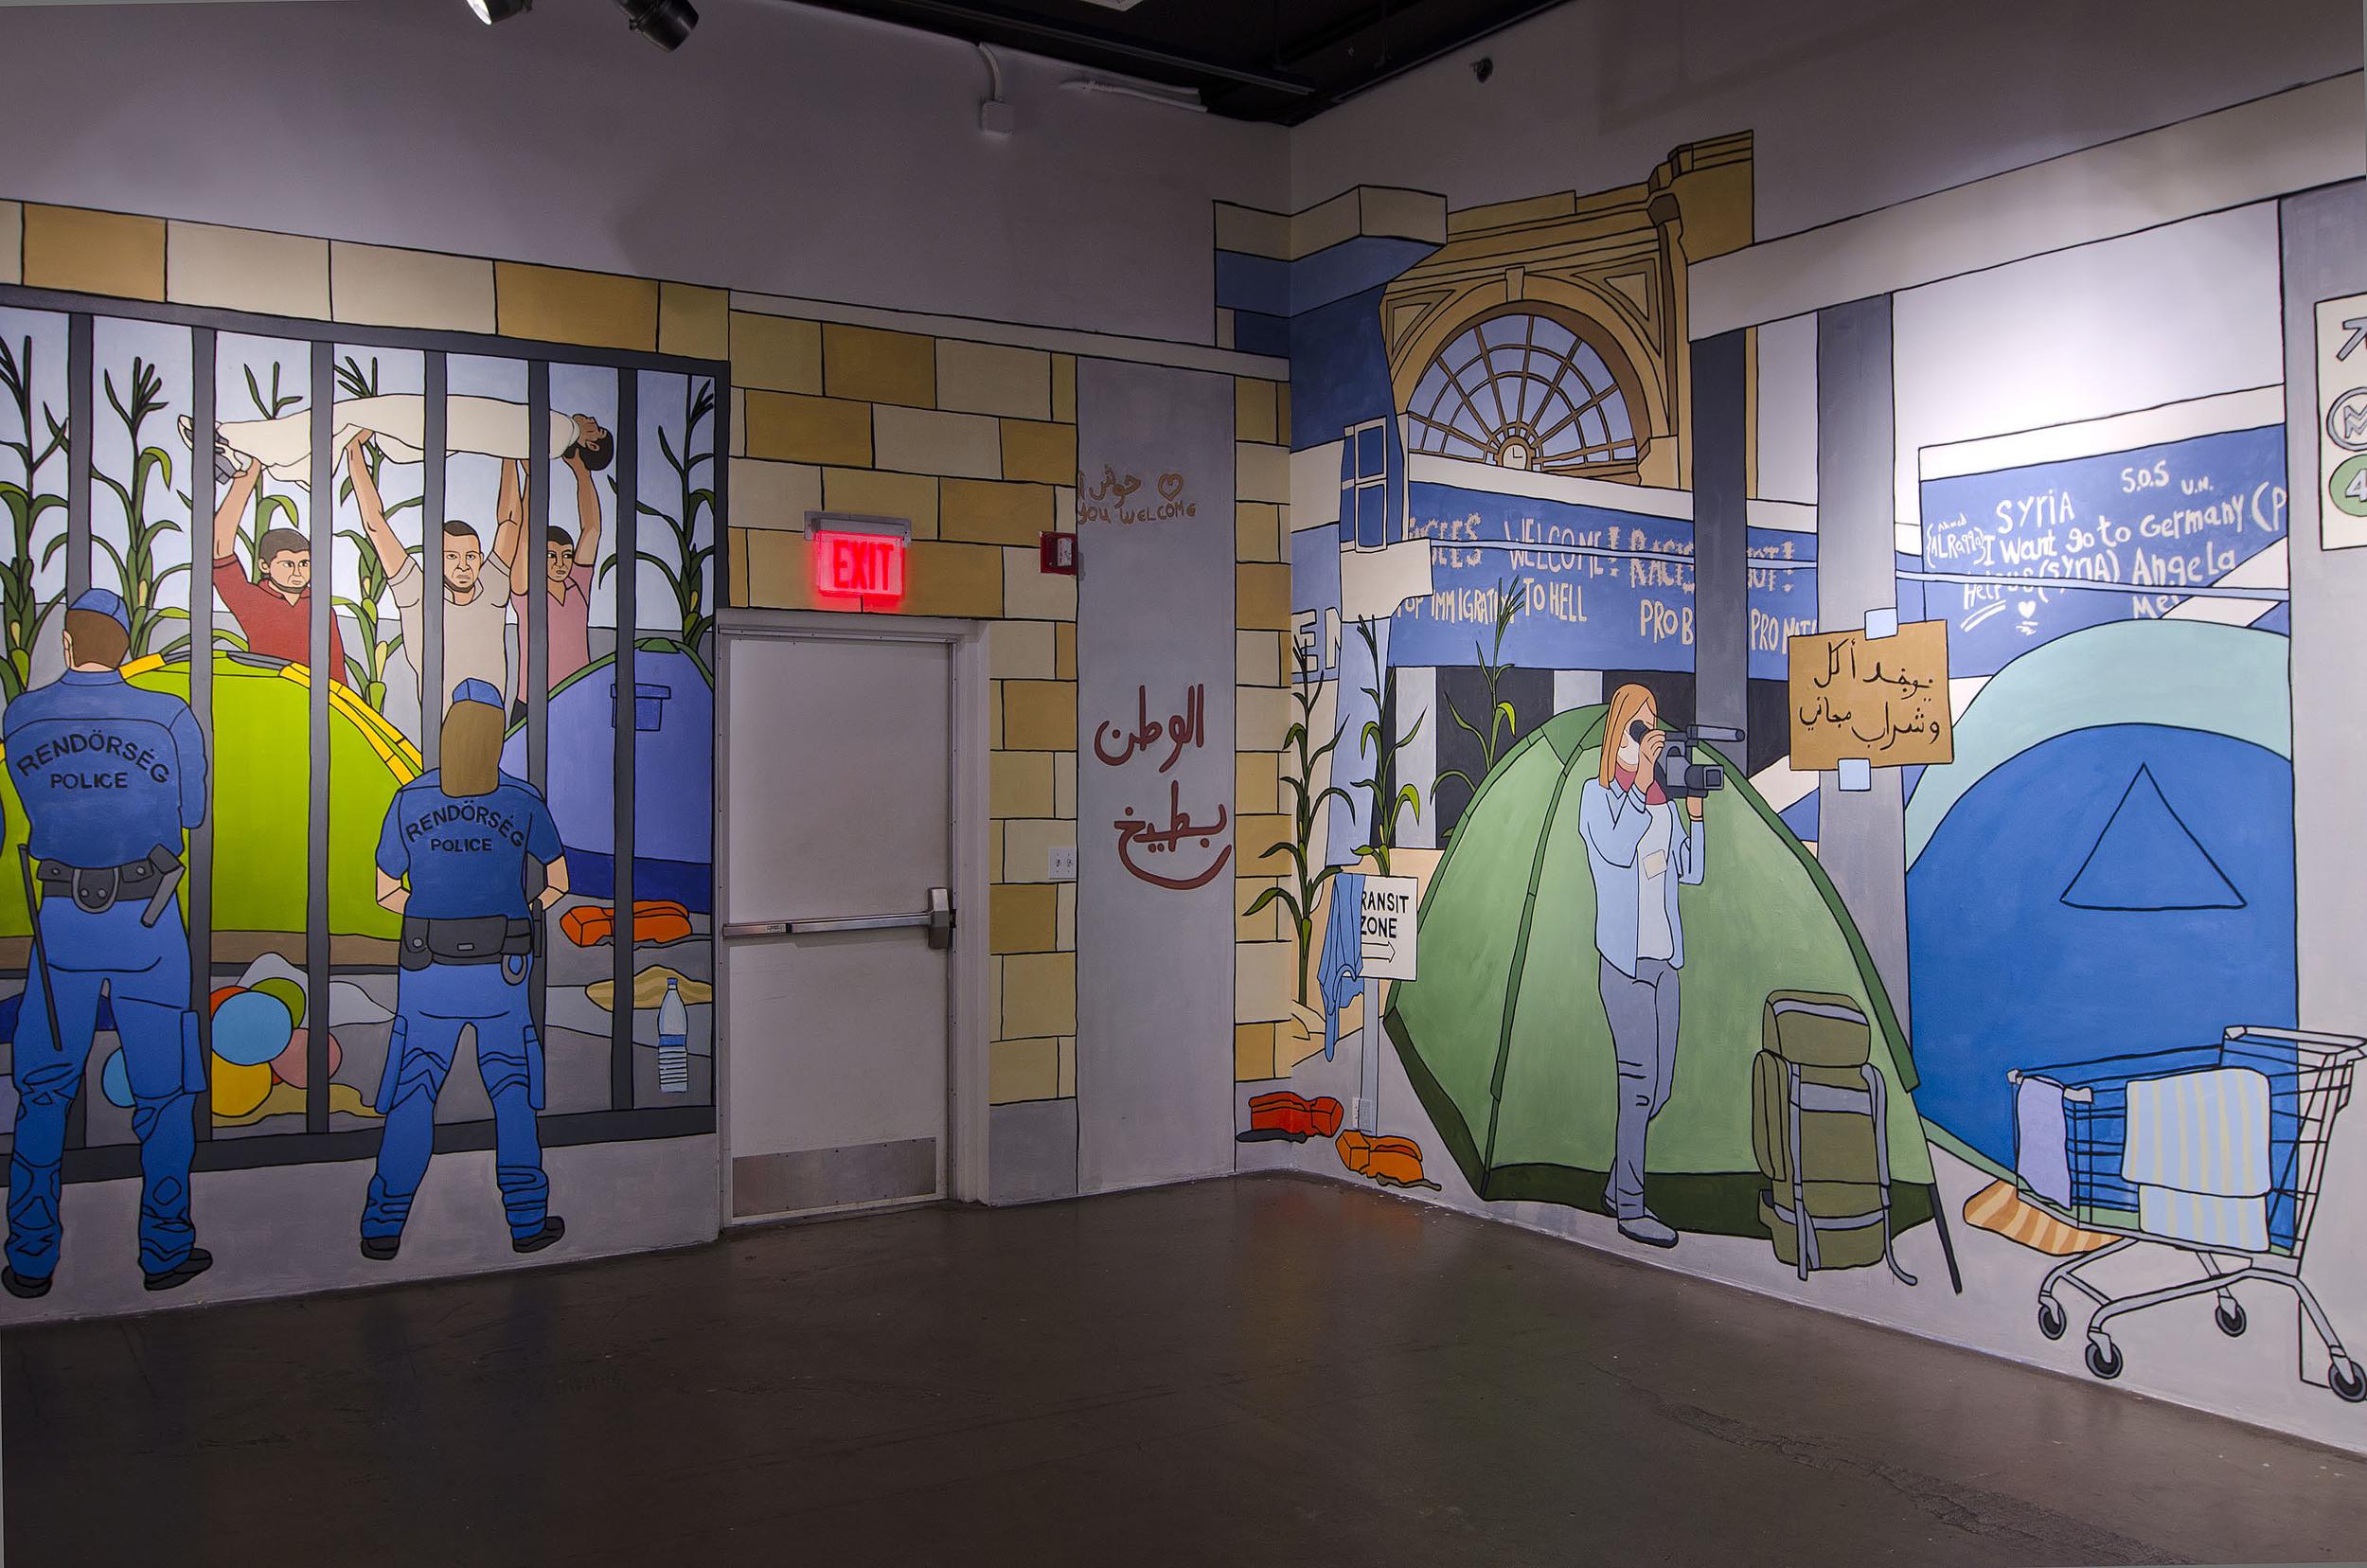 Main gallery wall 14 x 3.5 mt, side walls 5 x 3.5 mt, egg tempera, 2016.